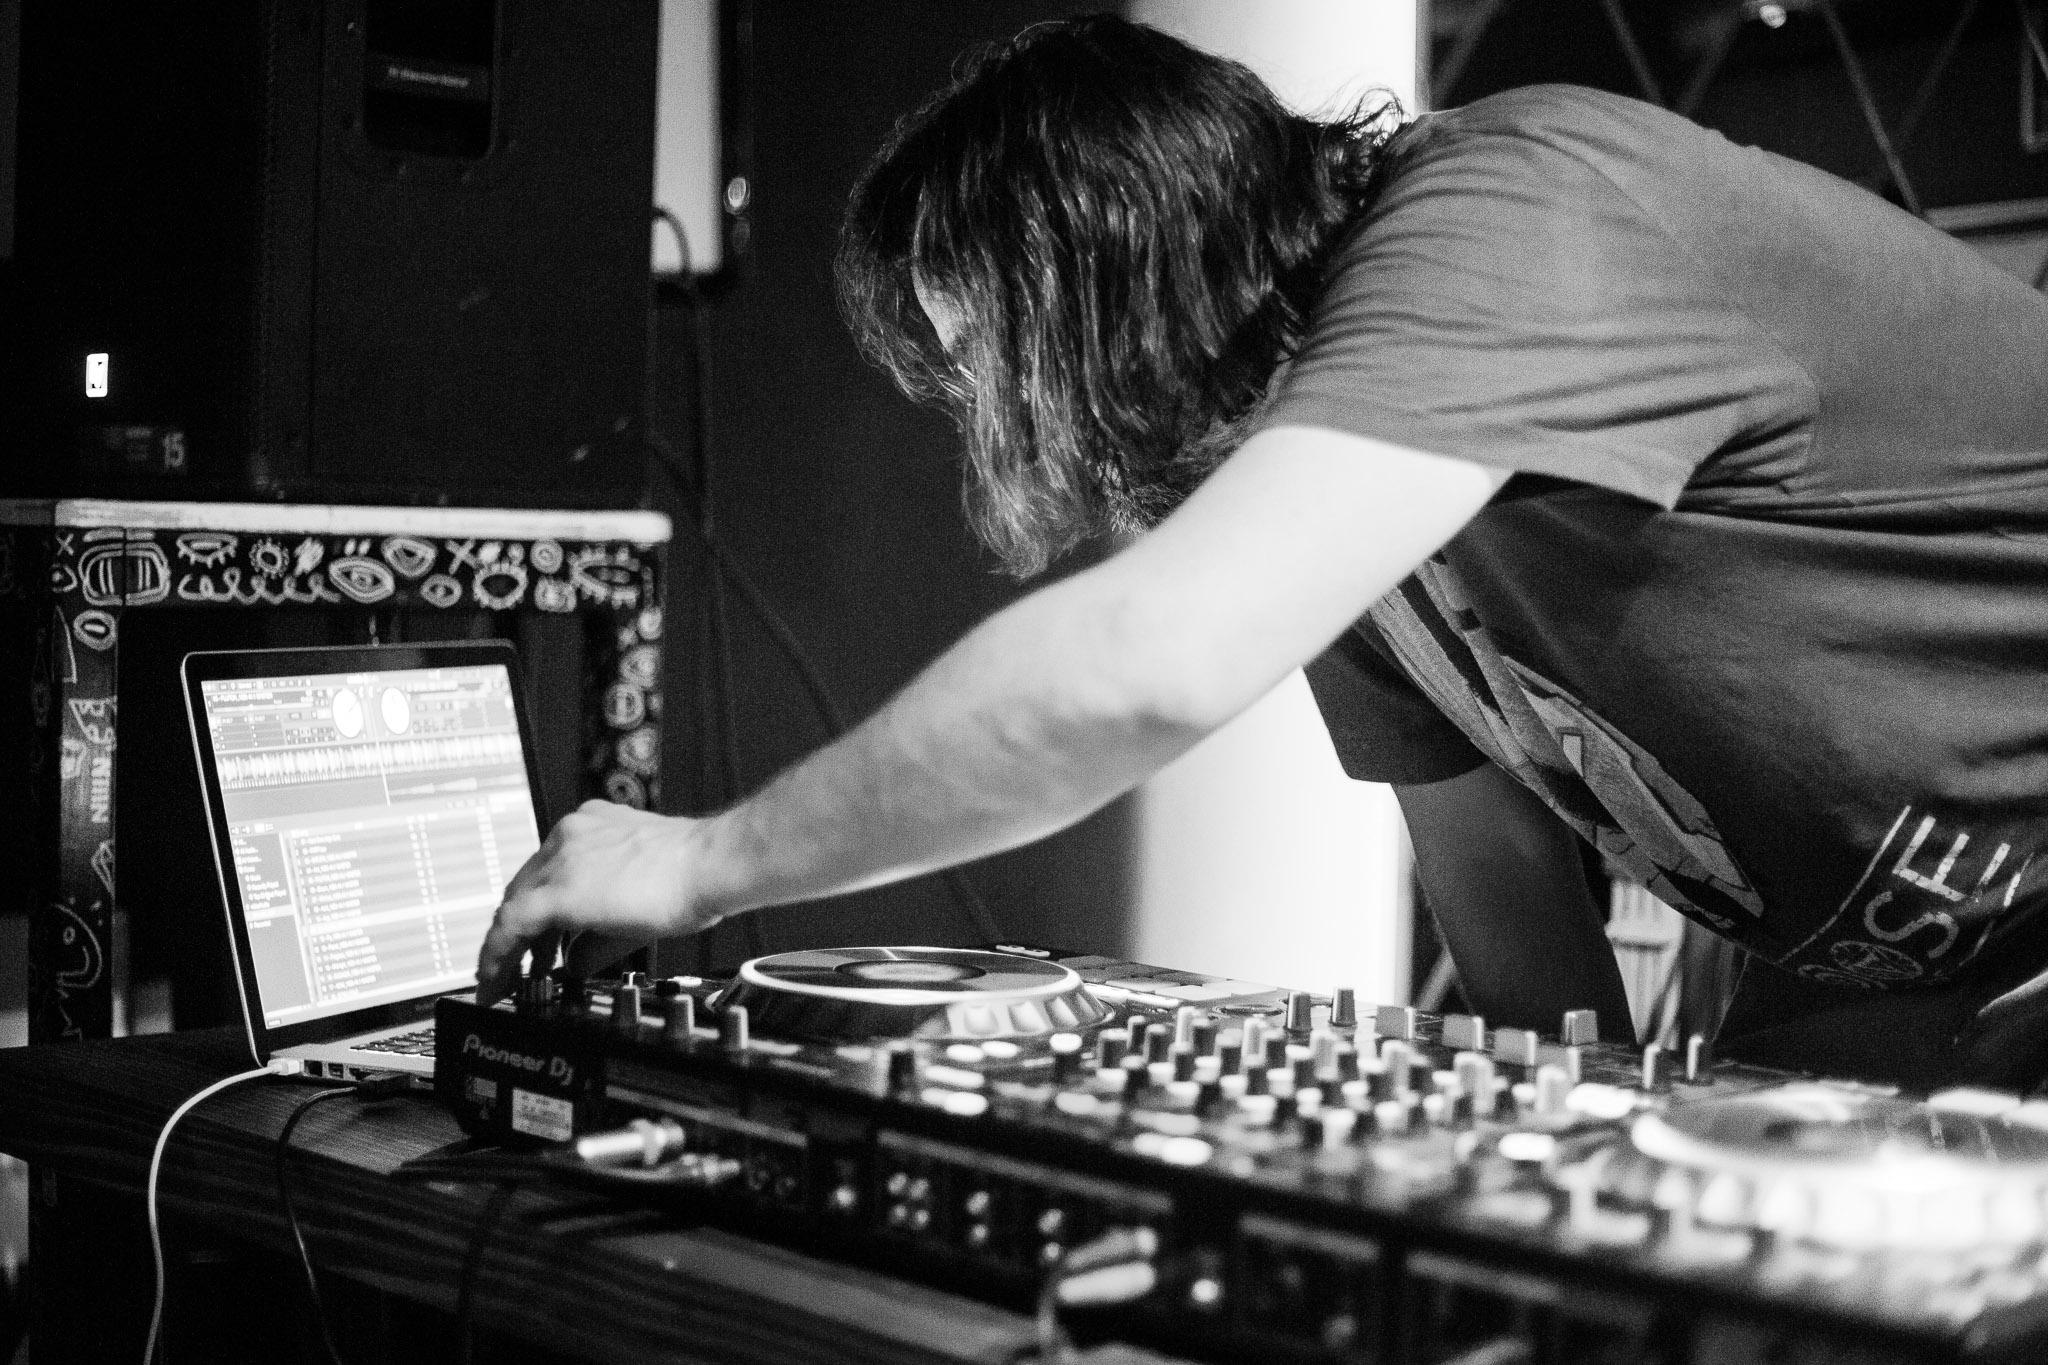 drumelody, berin tuzlic, elektro muzika, elektro pop, radiokiller, ambasador nagrada, muzika, artist, umetnost, umetnik, izvođač, DJ, DJ-ing, drum-ing